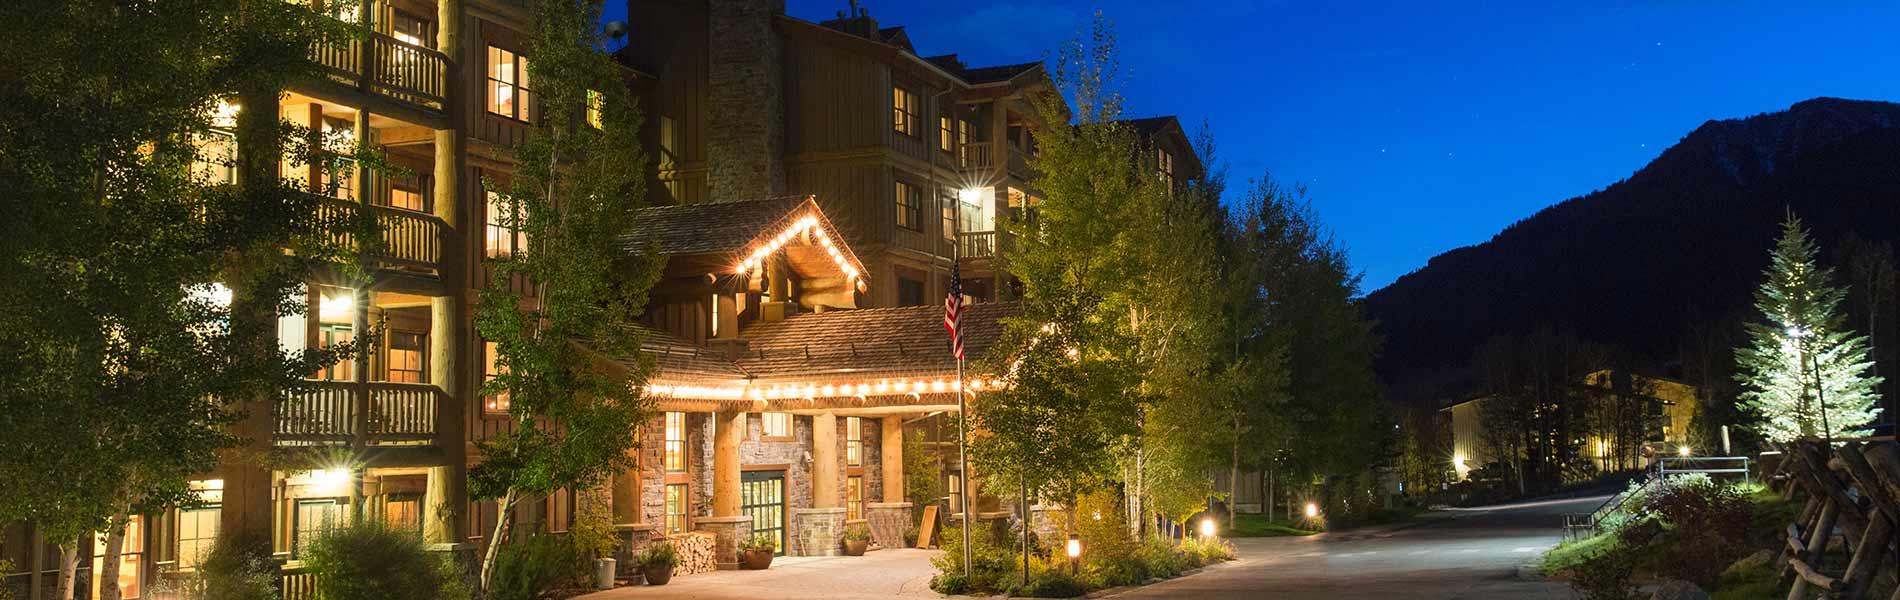 Things to do in Teton Village Jackson Hole